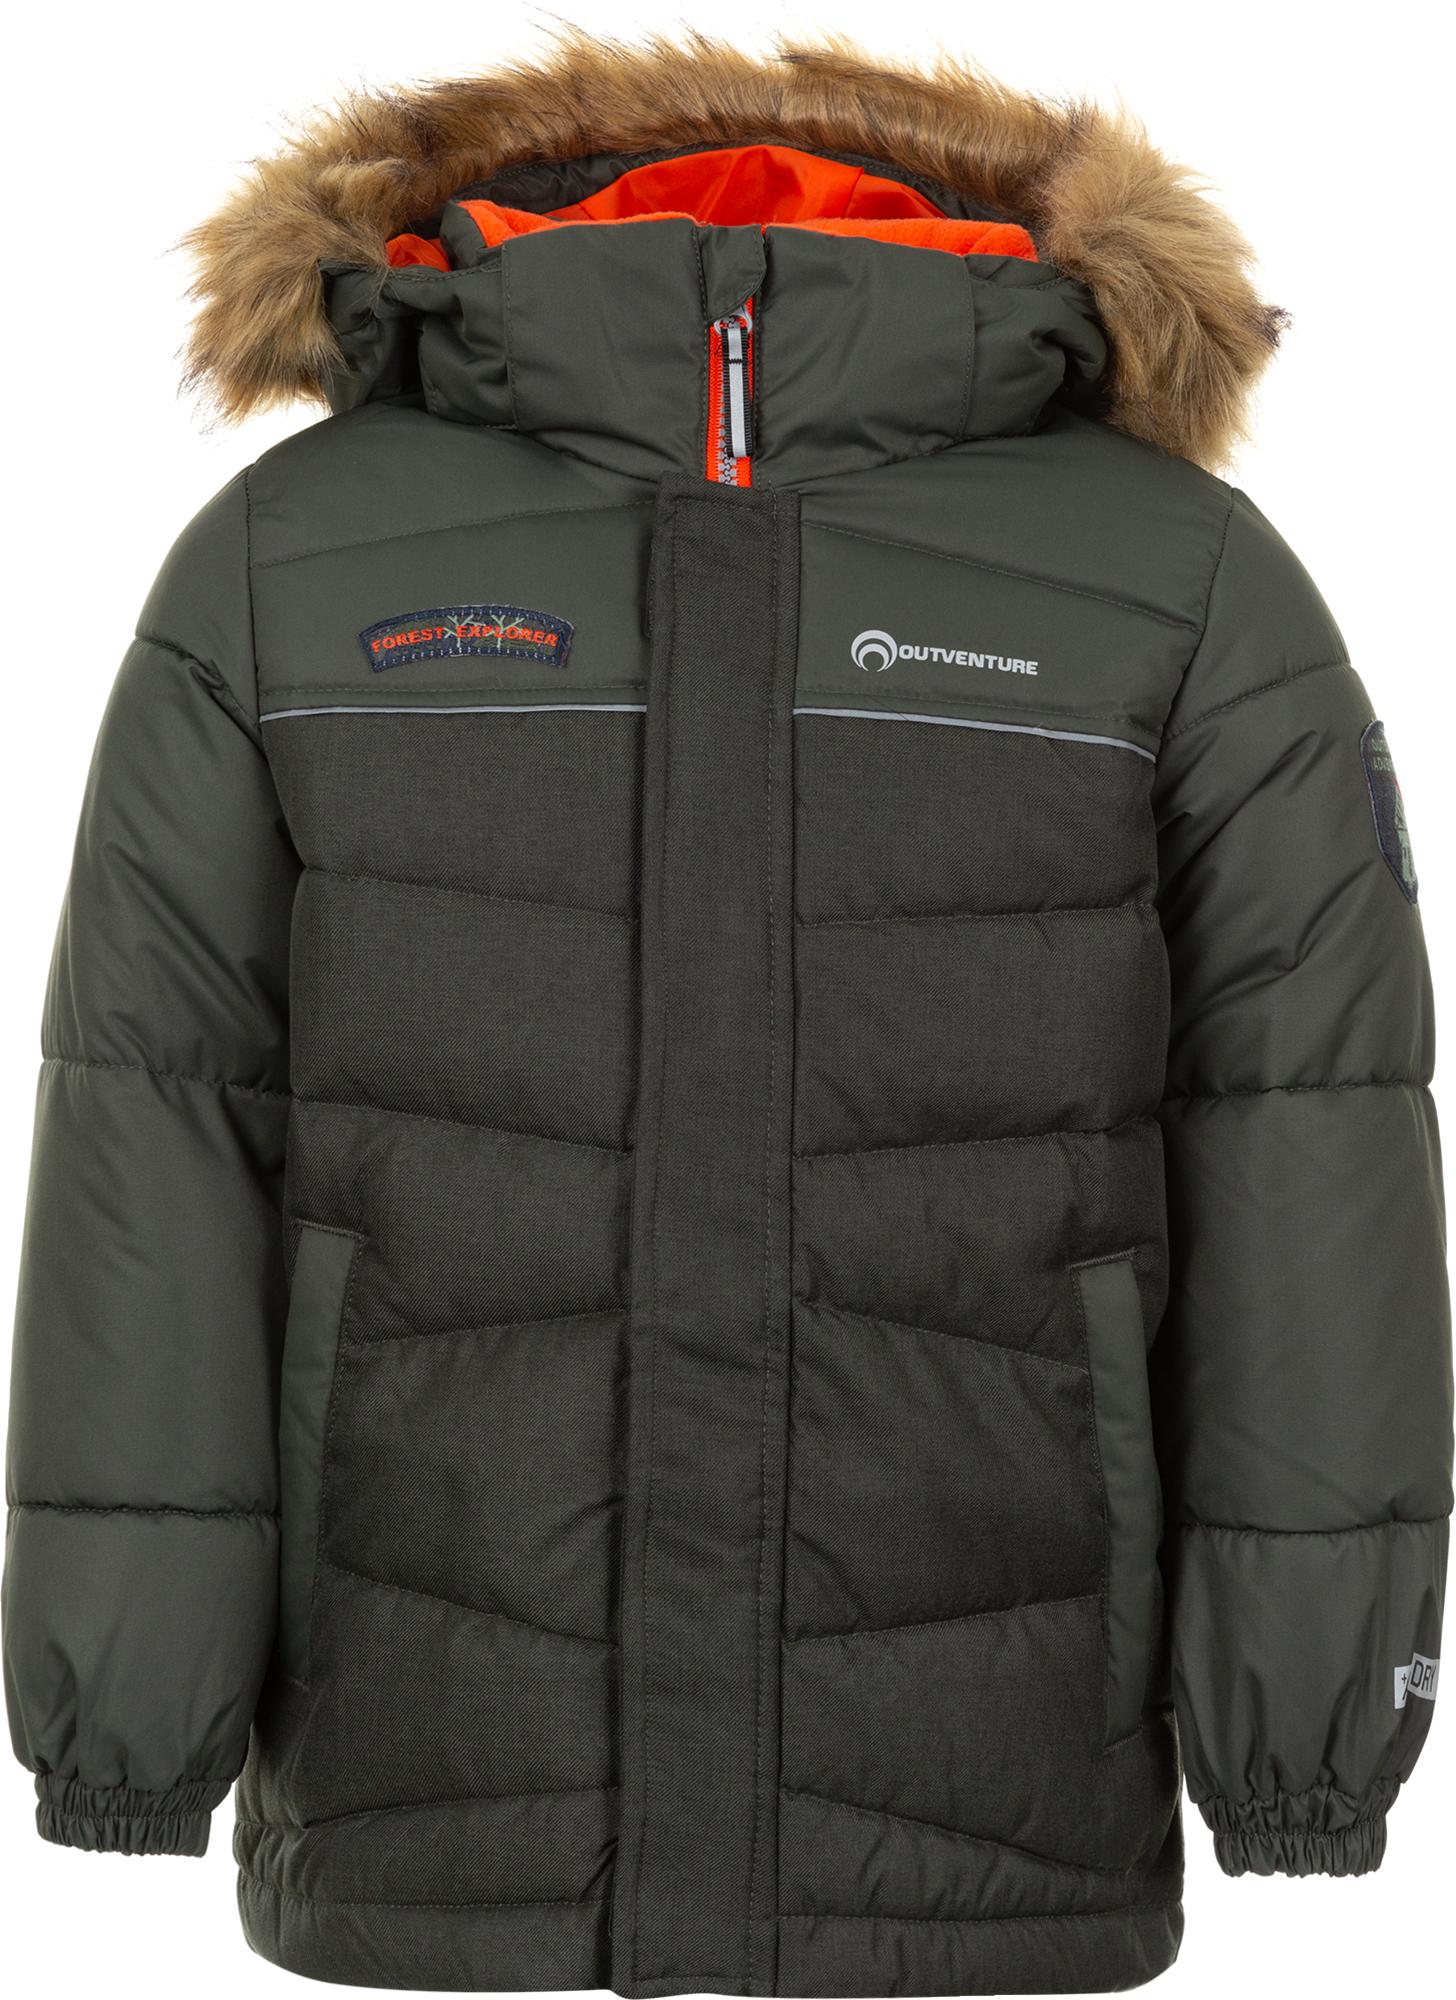 Outventure Куртка пуховая для мальчиков Outventure, размер 104